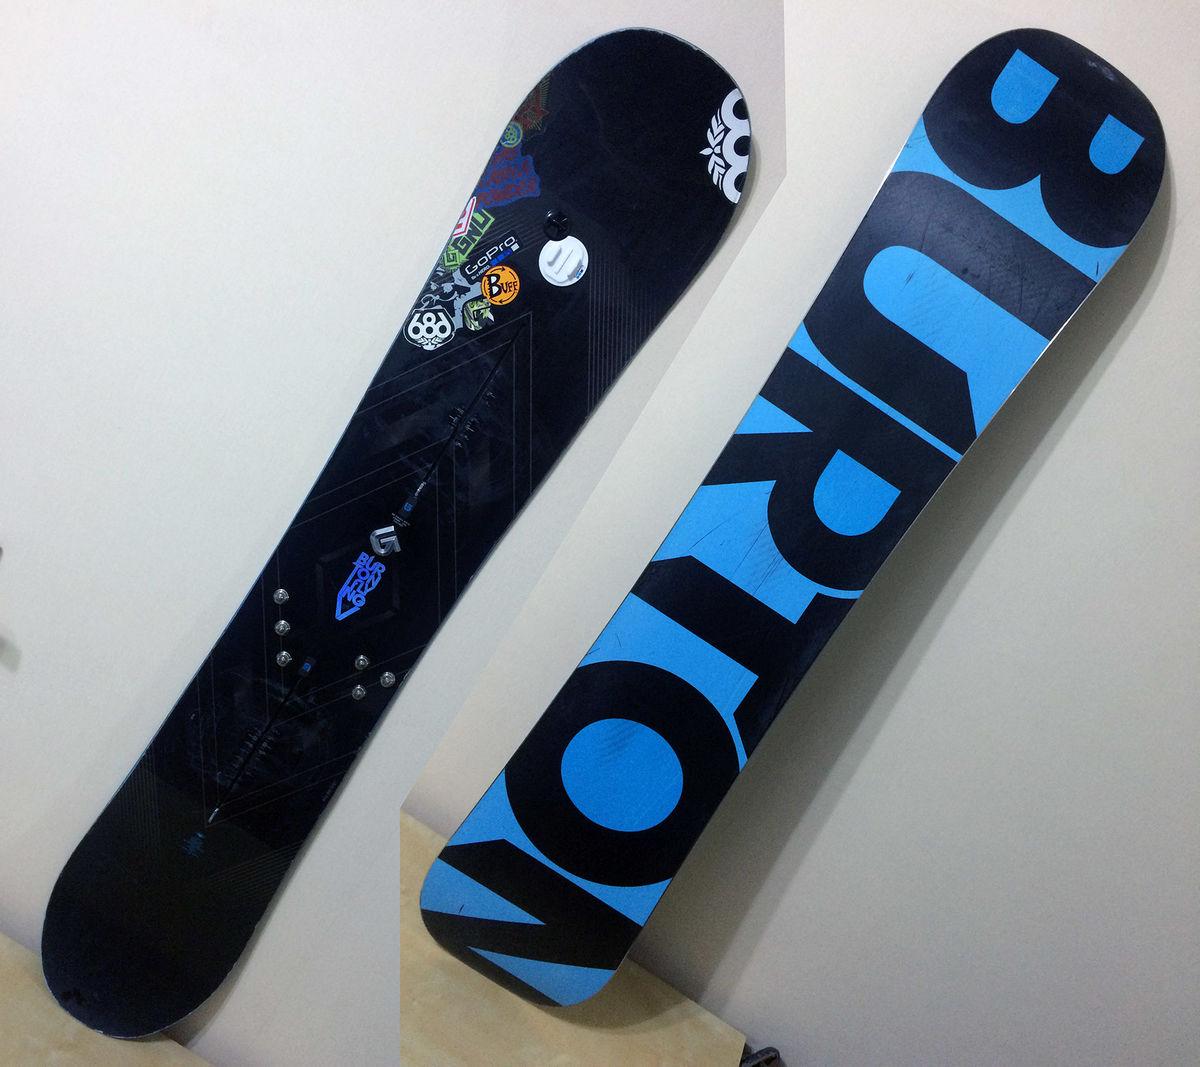 купить сноуборд на авито